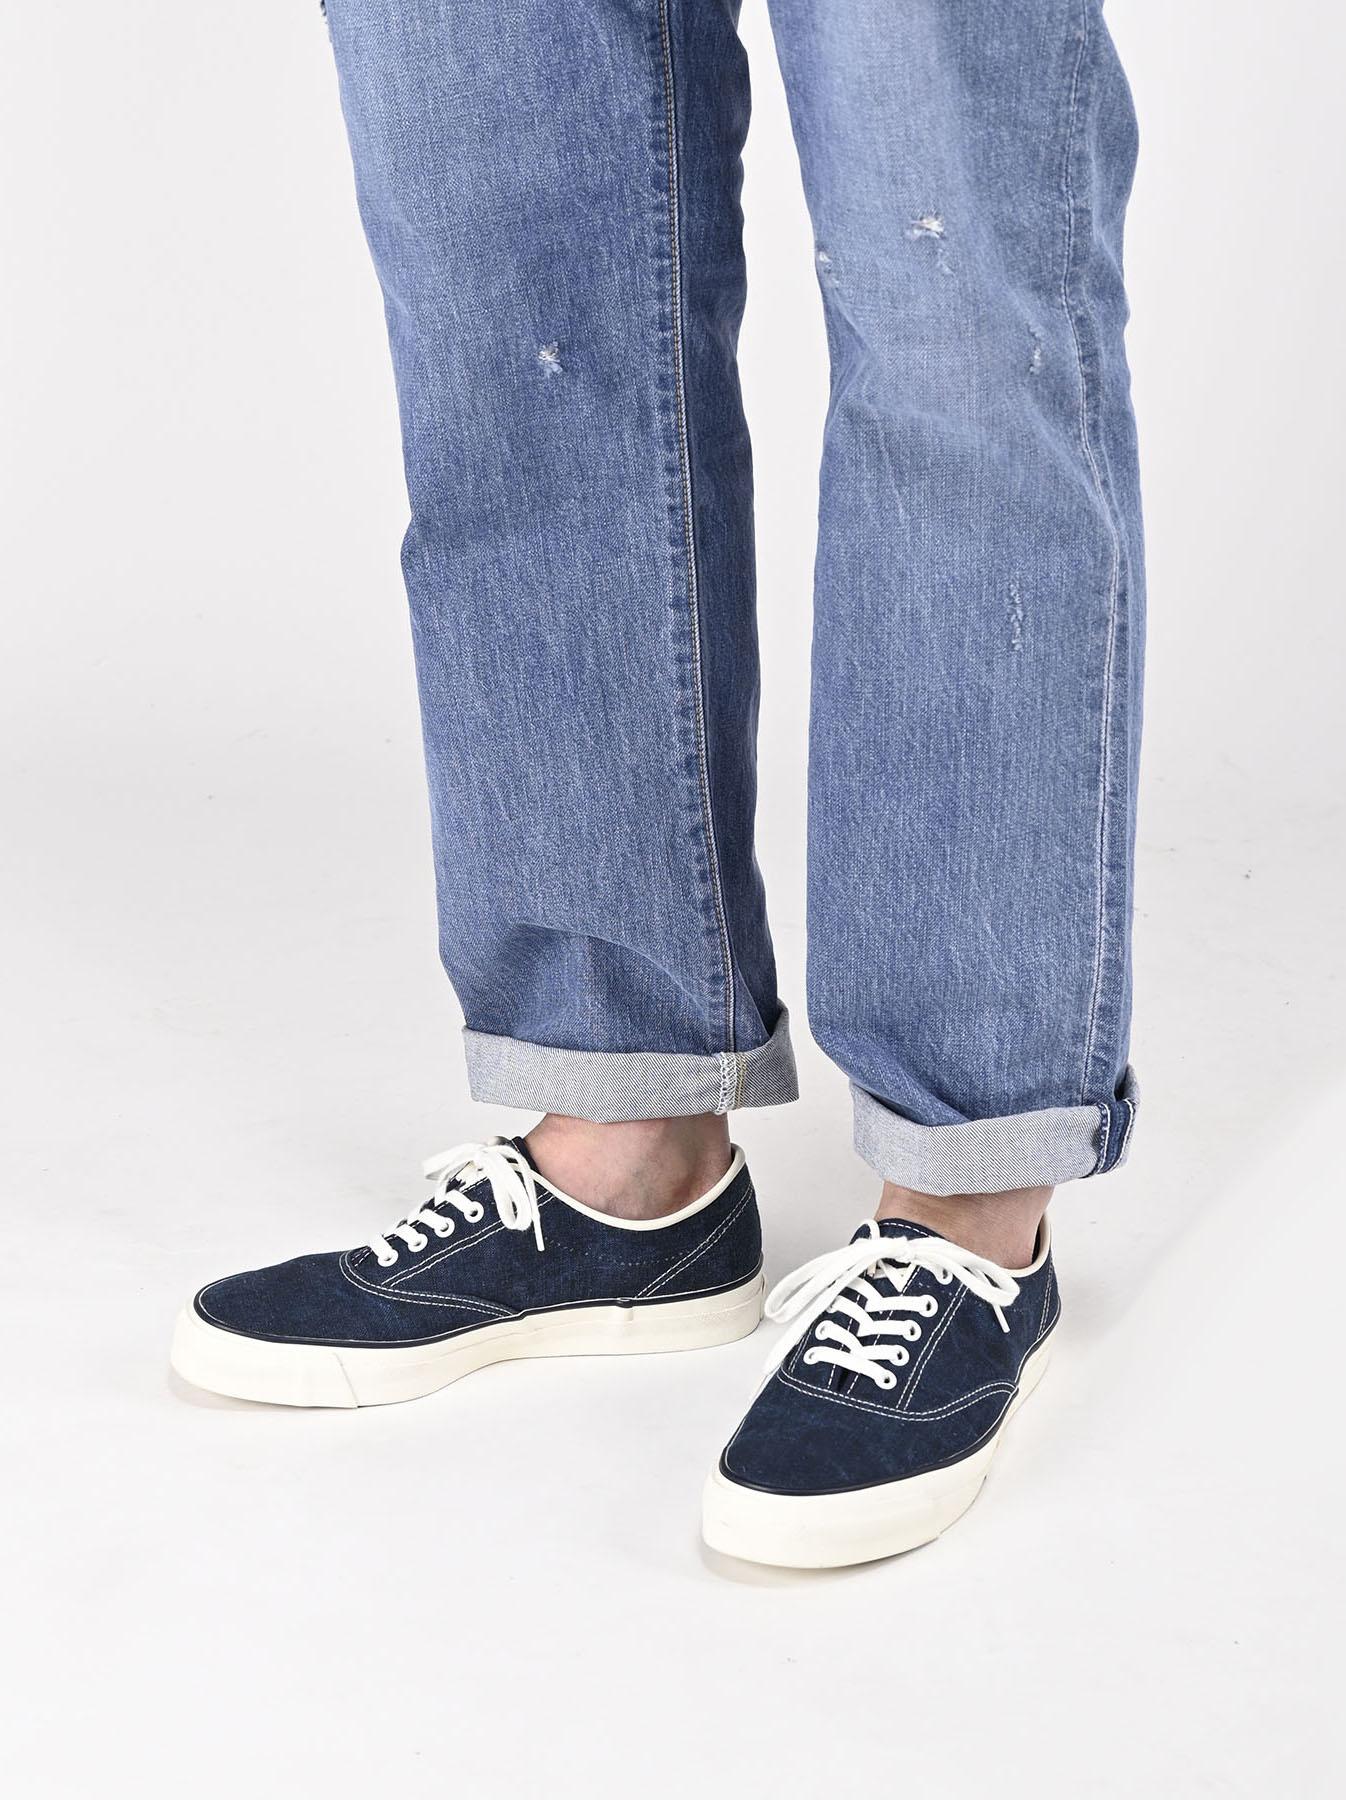 Indigo Linen Duck Sneaker size 5.5-7.5 UK-2